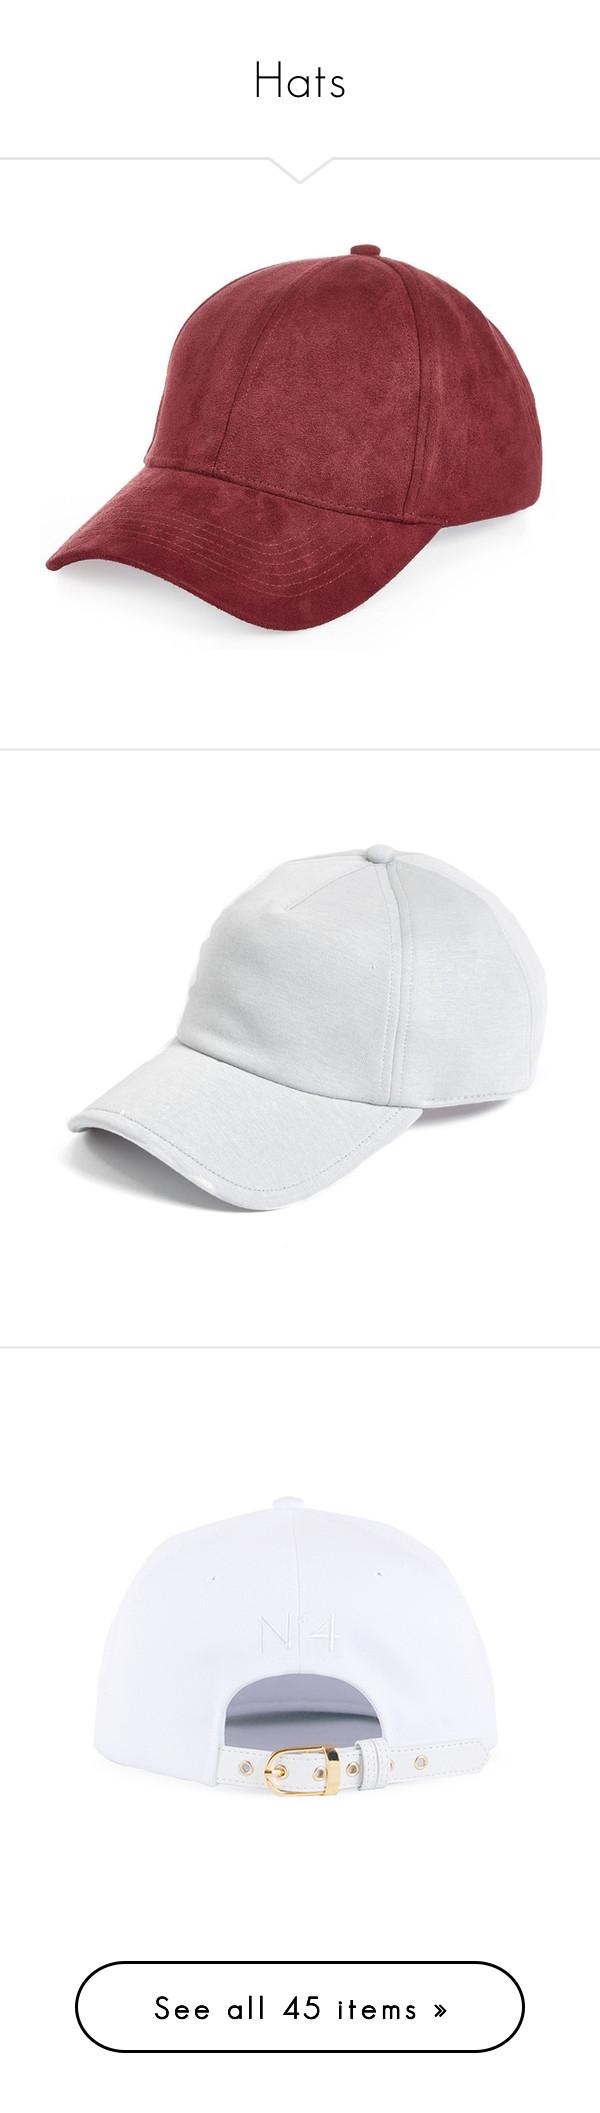 7a277f290 Hats